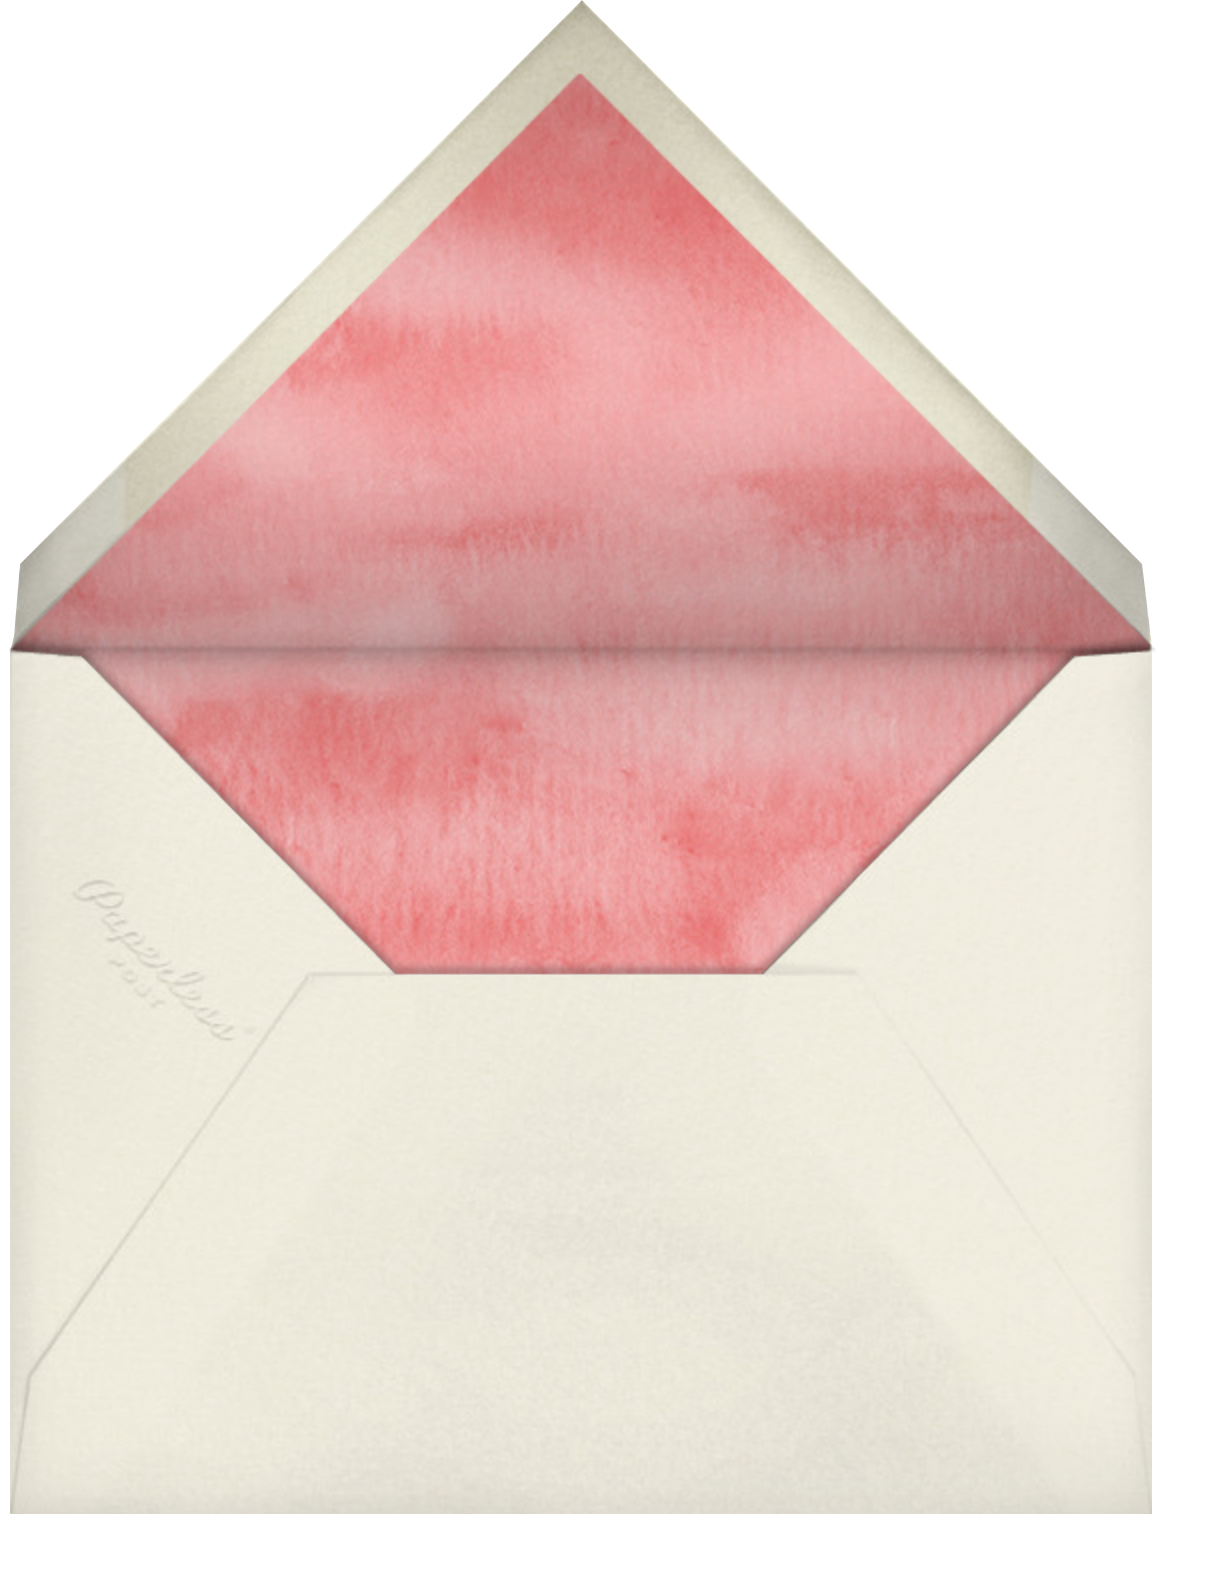 Home Sweet Home - Felix Doolittle - Moving - envelope back